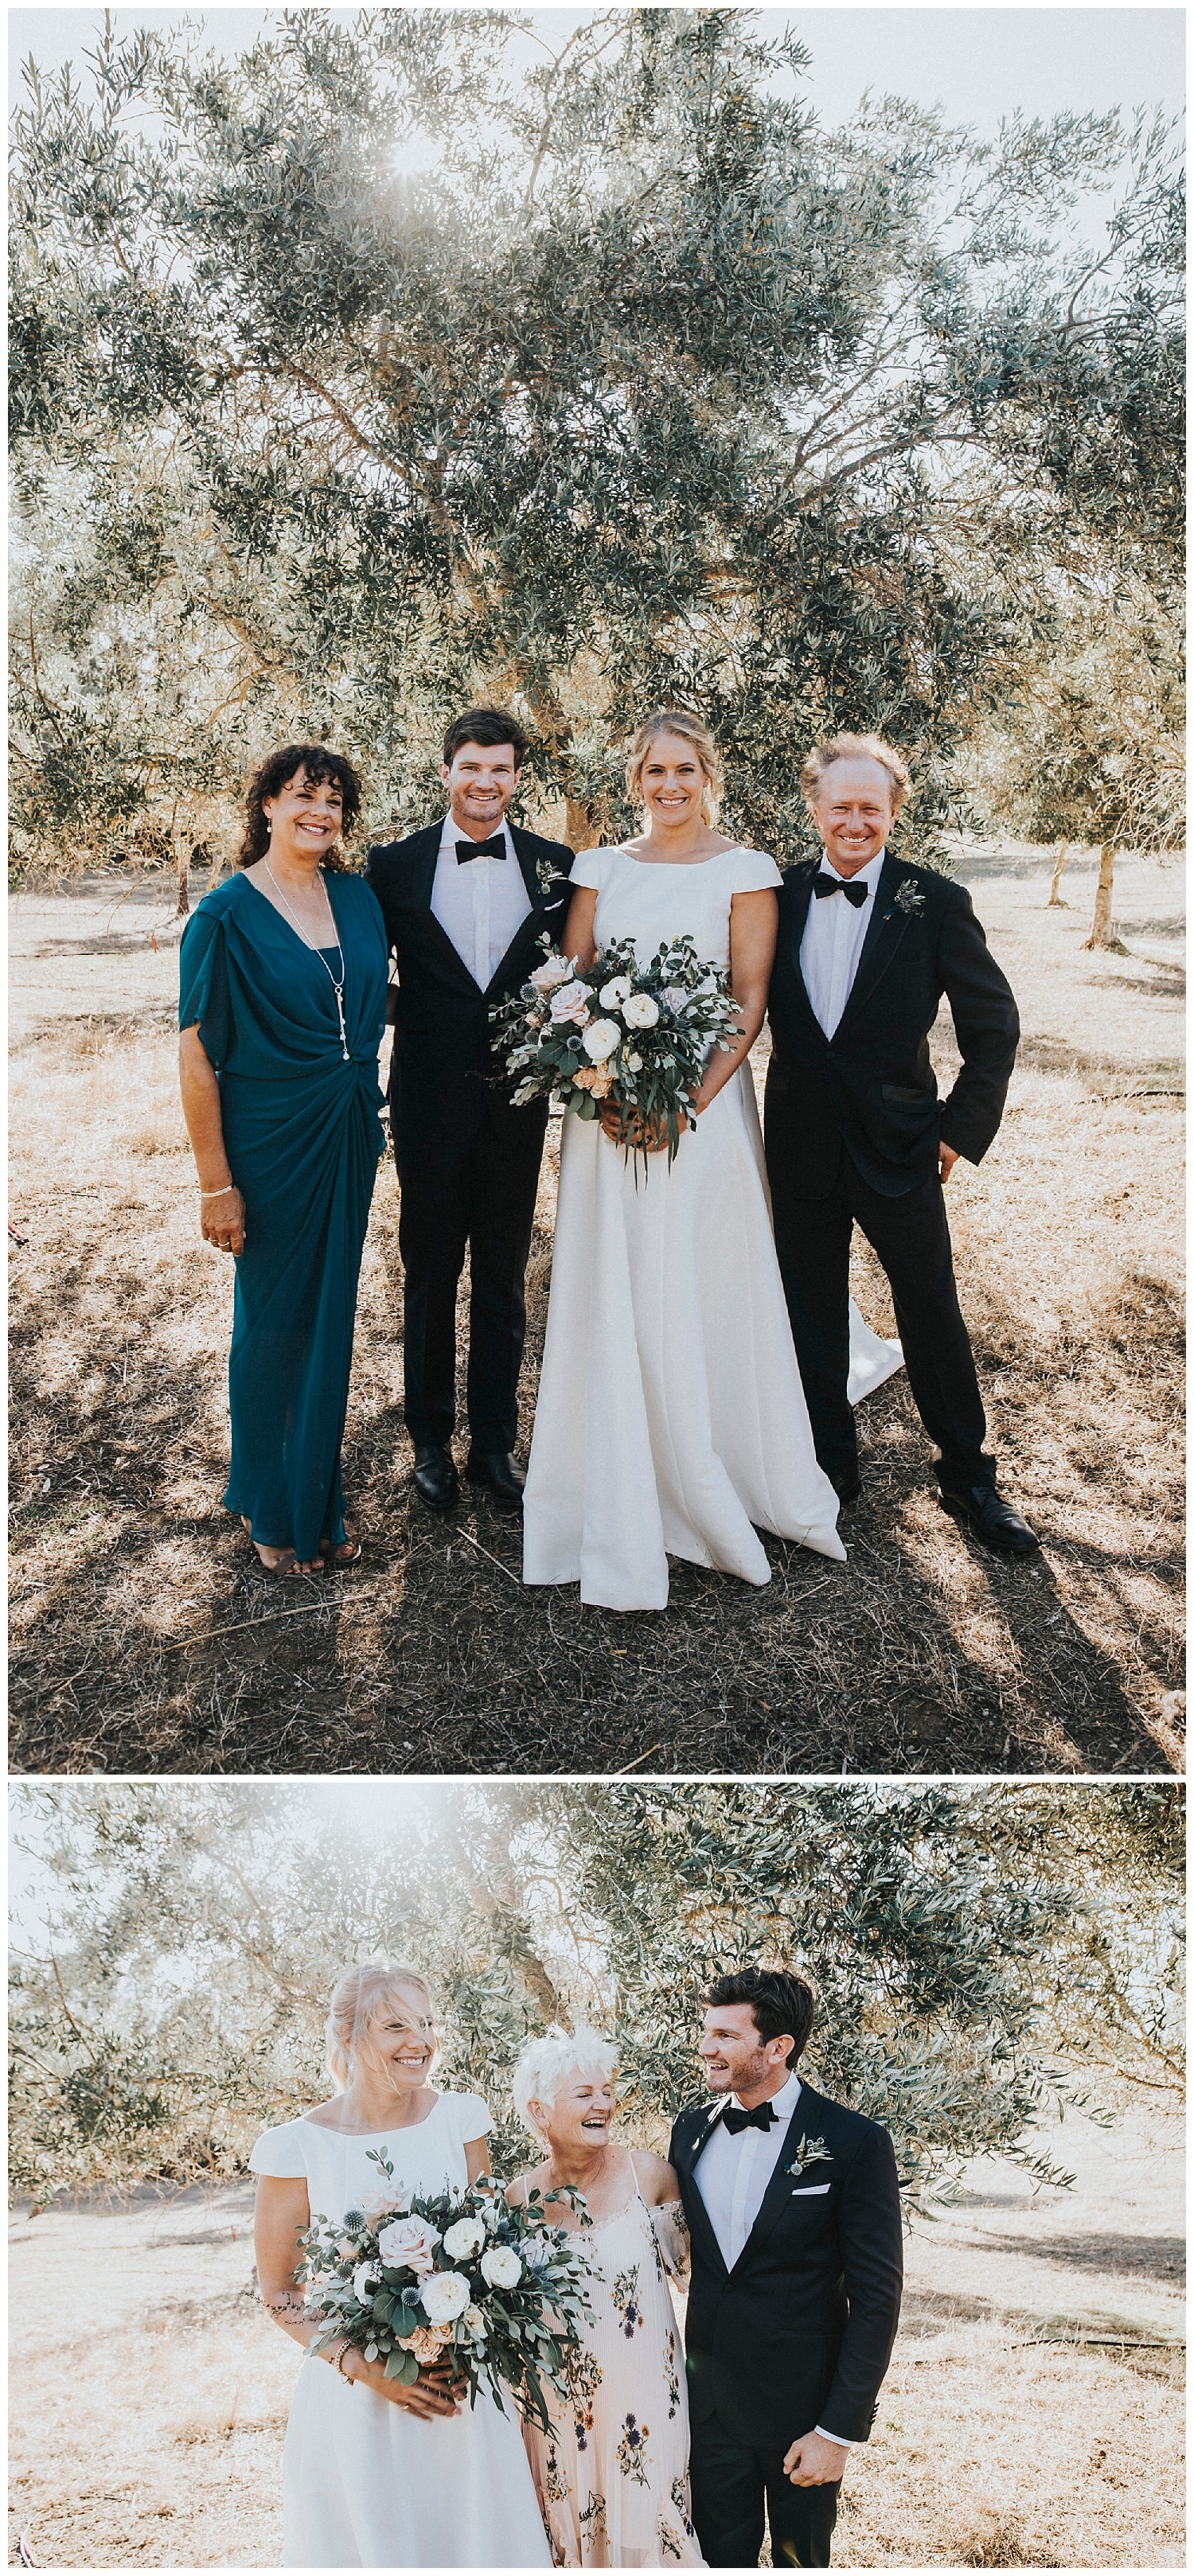 olio_bello_wedding_keeper_creative_017.JPG